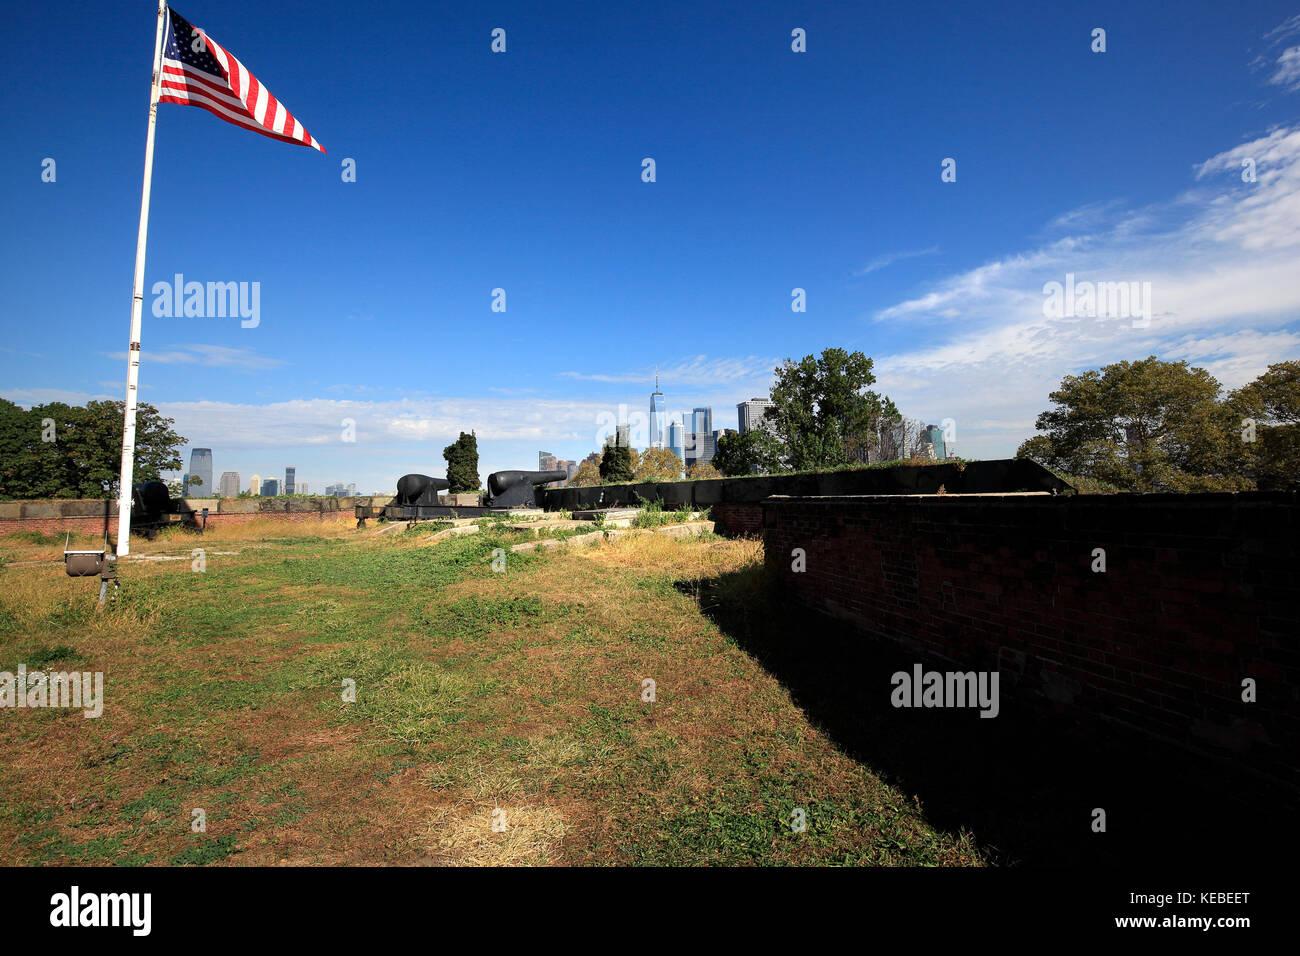 Rodman guns and Manhattan skyline at ford Jay,Governors Island, New York City - Stock Image